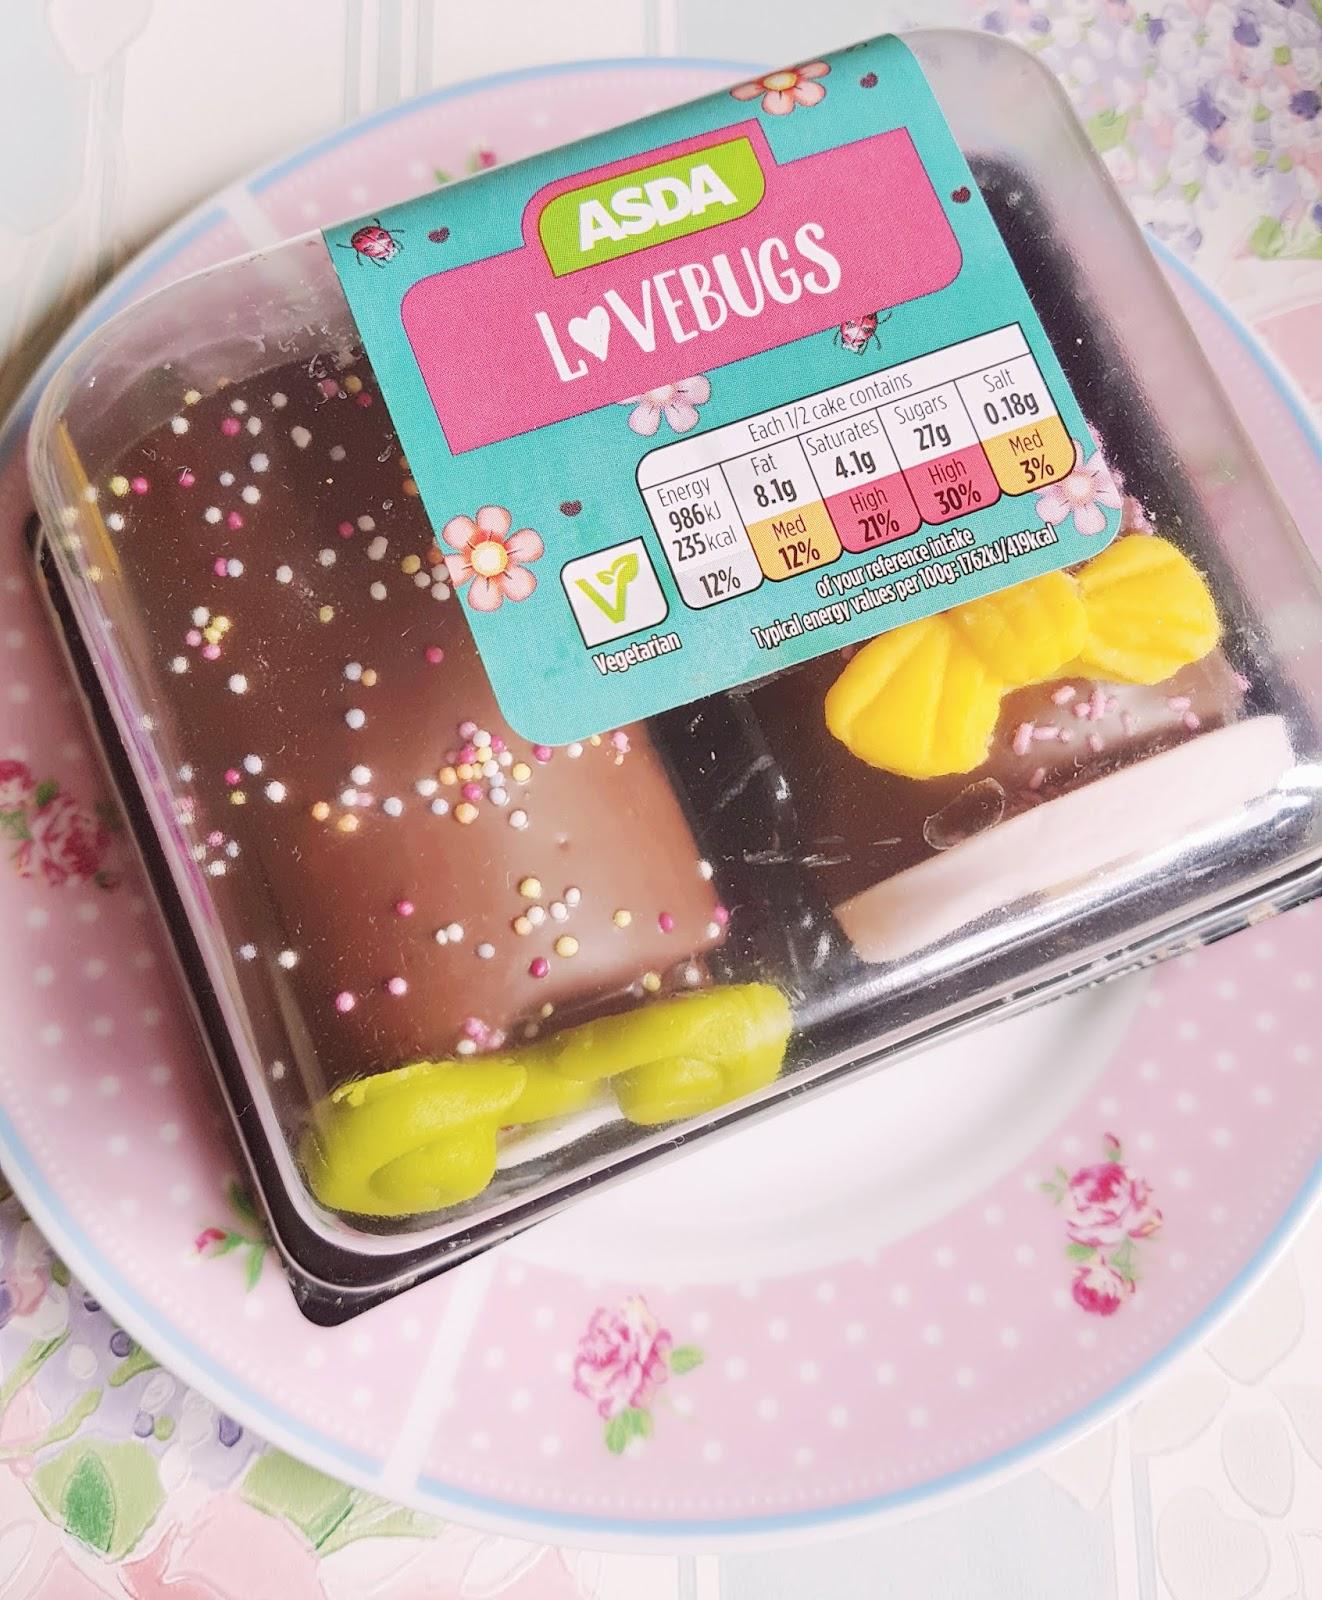 Asda Lovebugs Cake Review Bows And Pearls Bloglovin